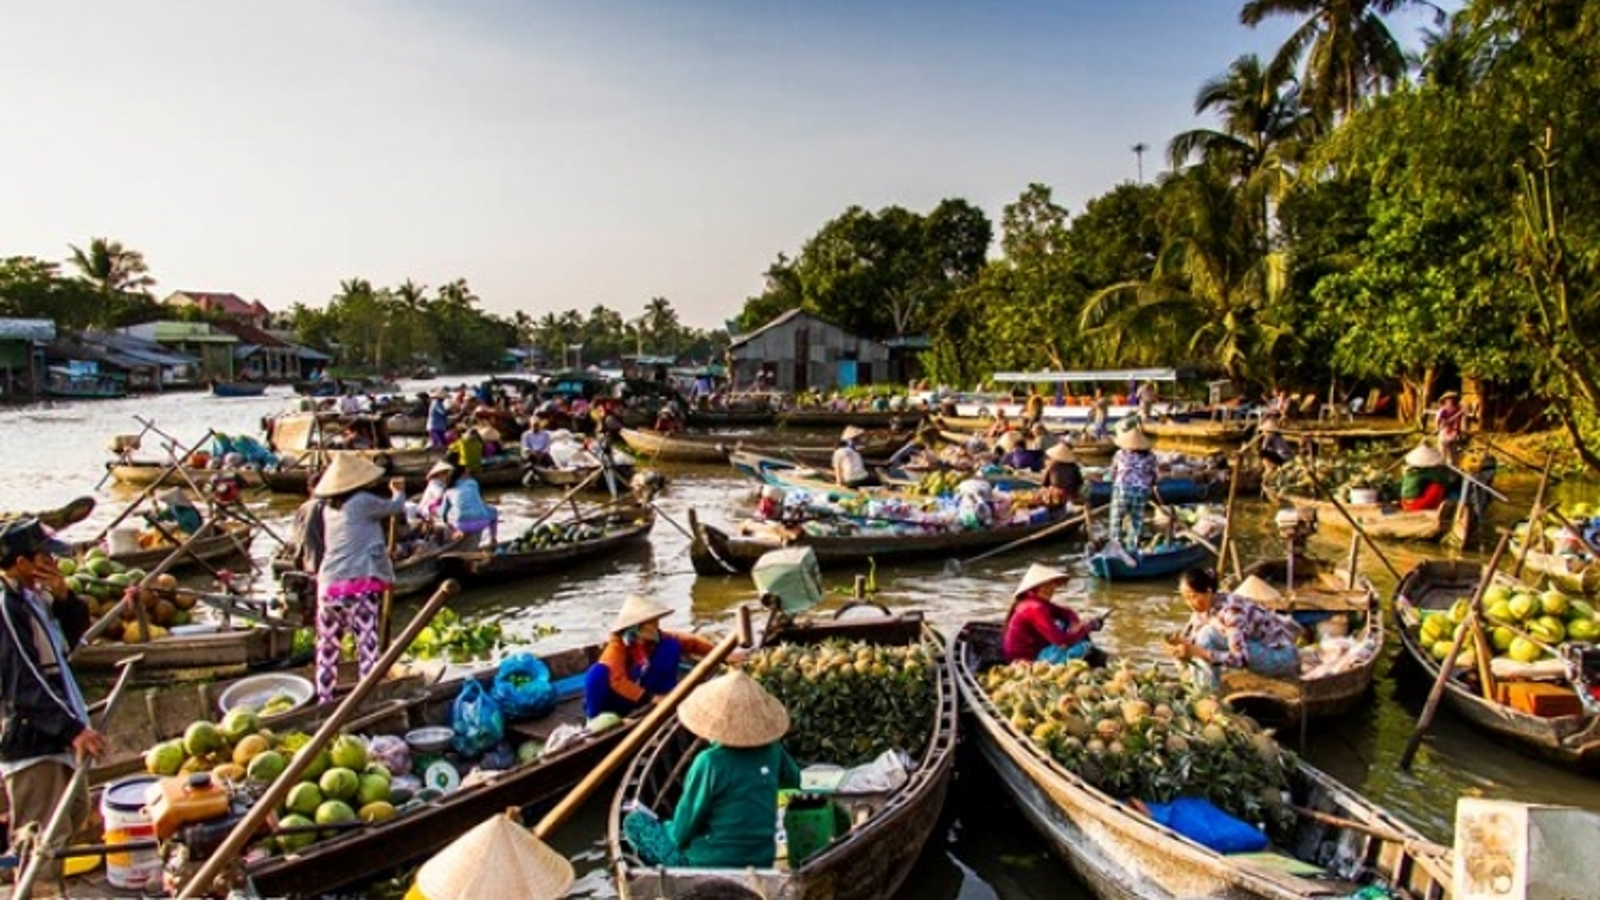 Around US$1.25 billion committed to Mekong Delta development